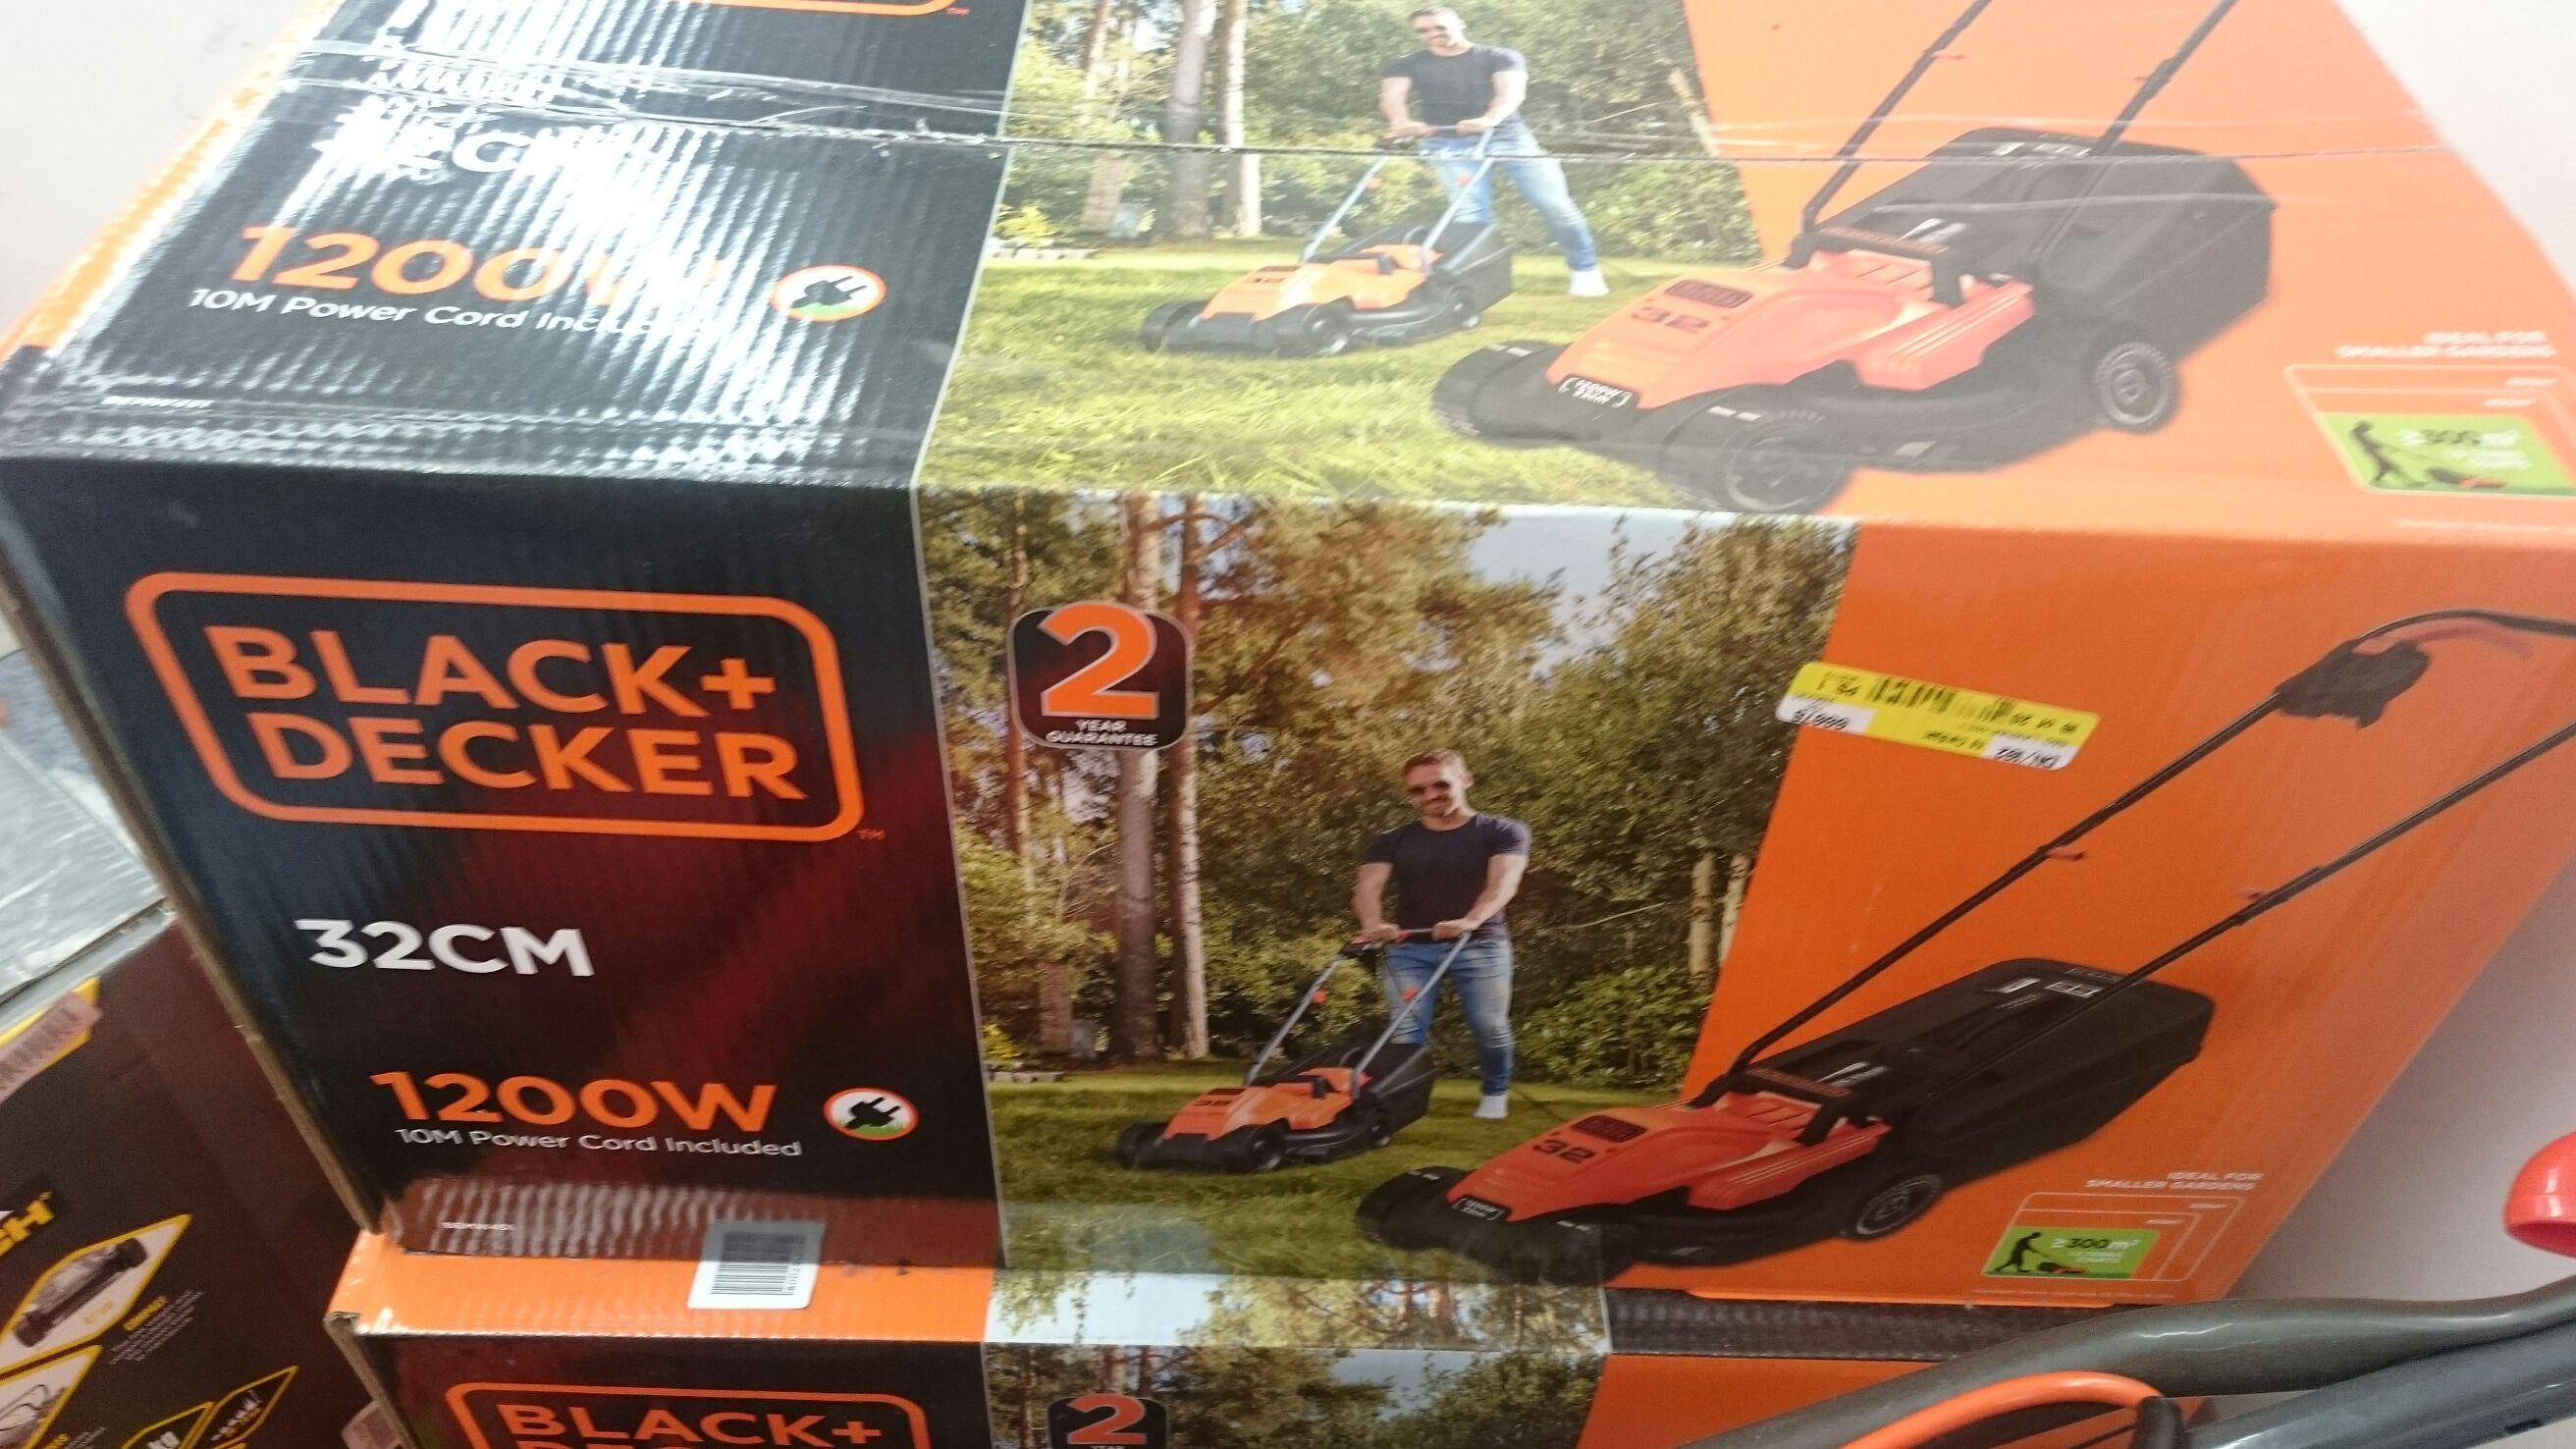 Black and Decker Edgemax  lawnmower down to 39.99 @ B&M Bargains